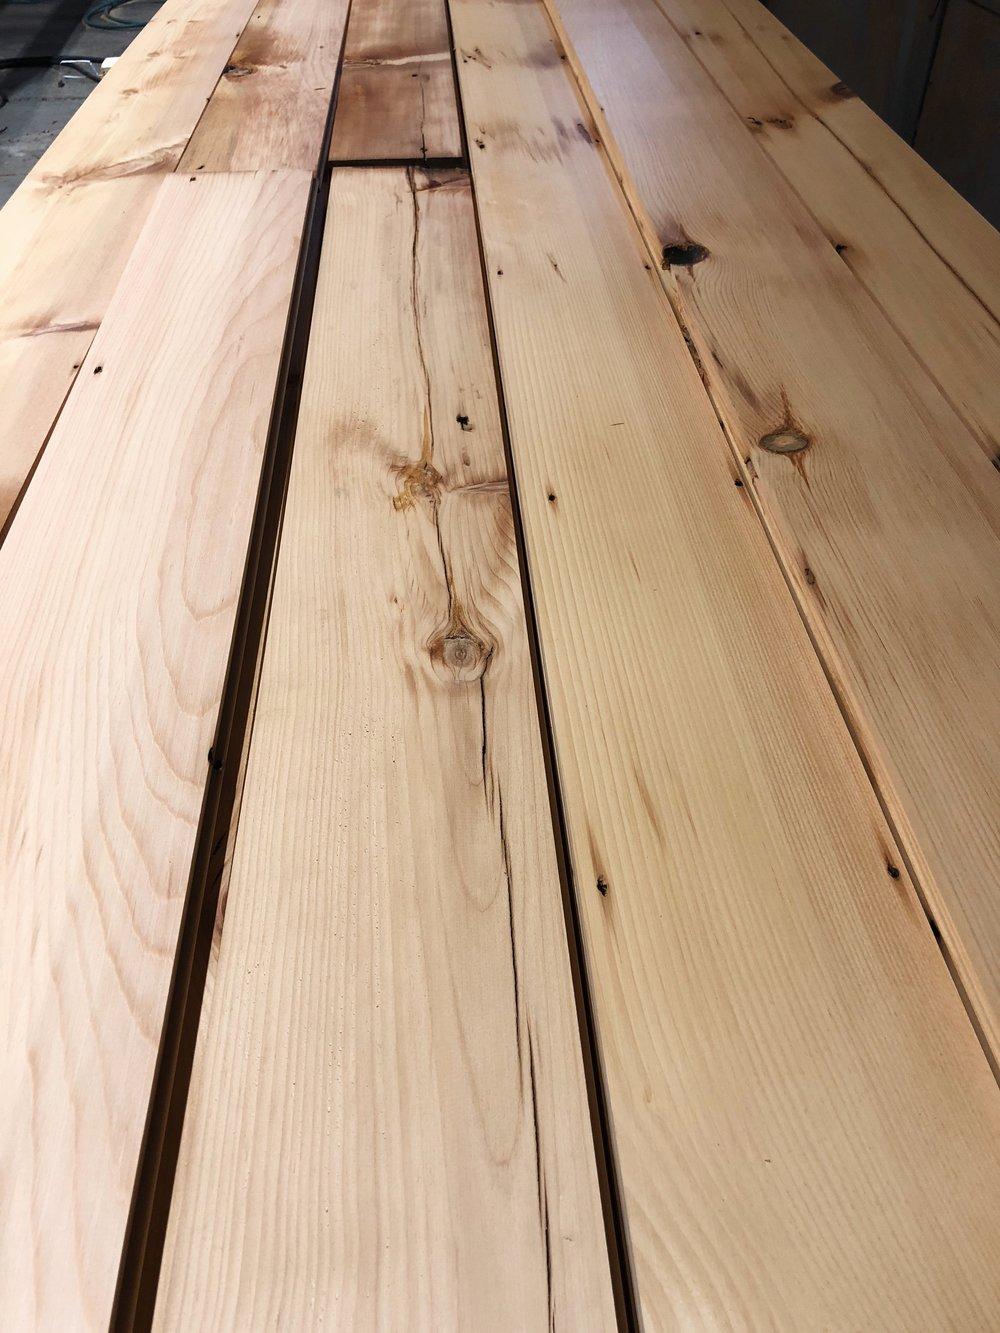 Reclaimed And Custom Hardwood Flooring